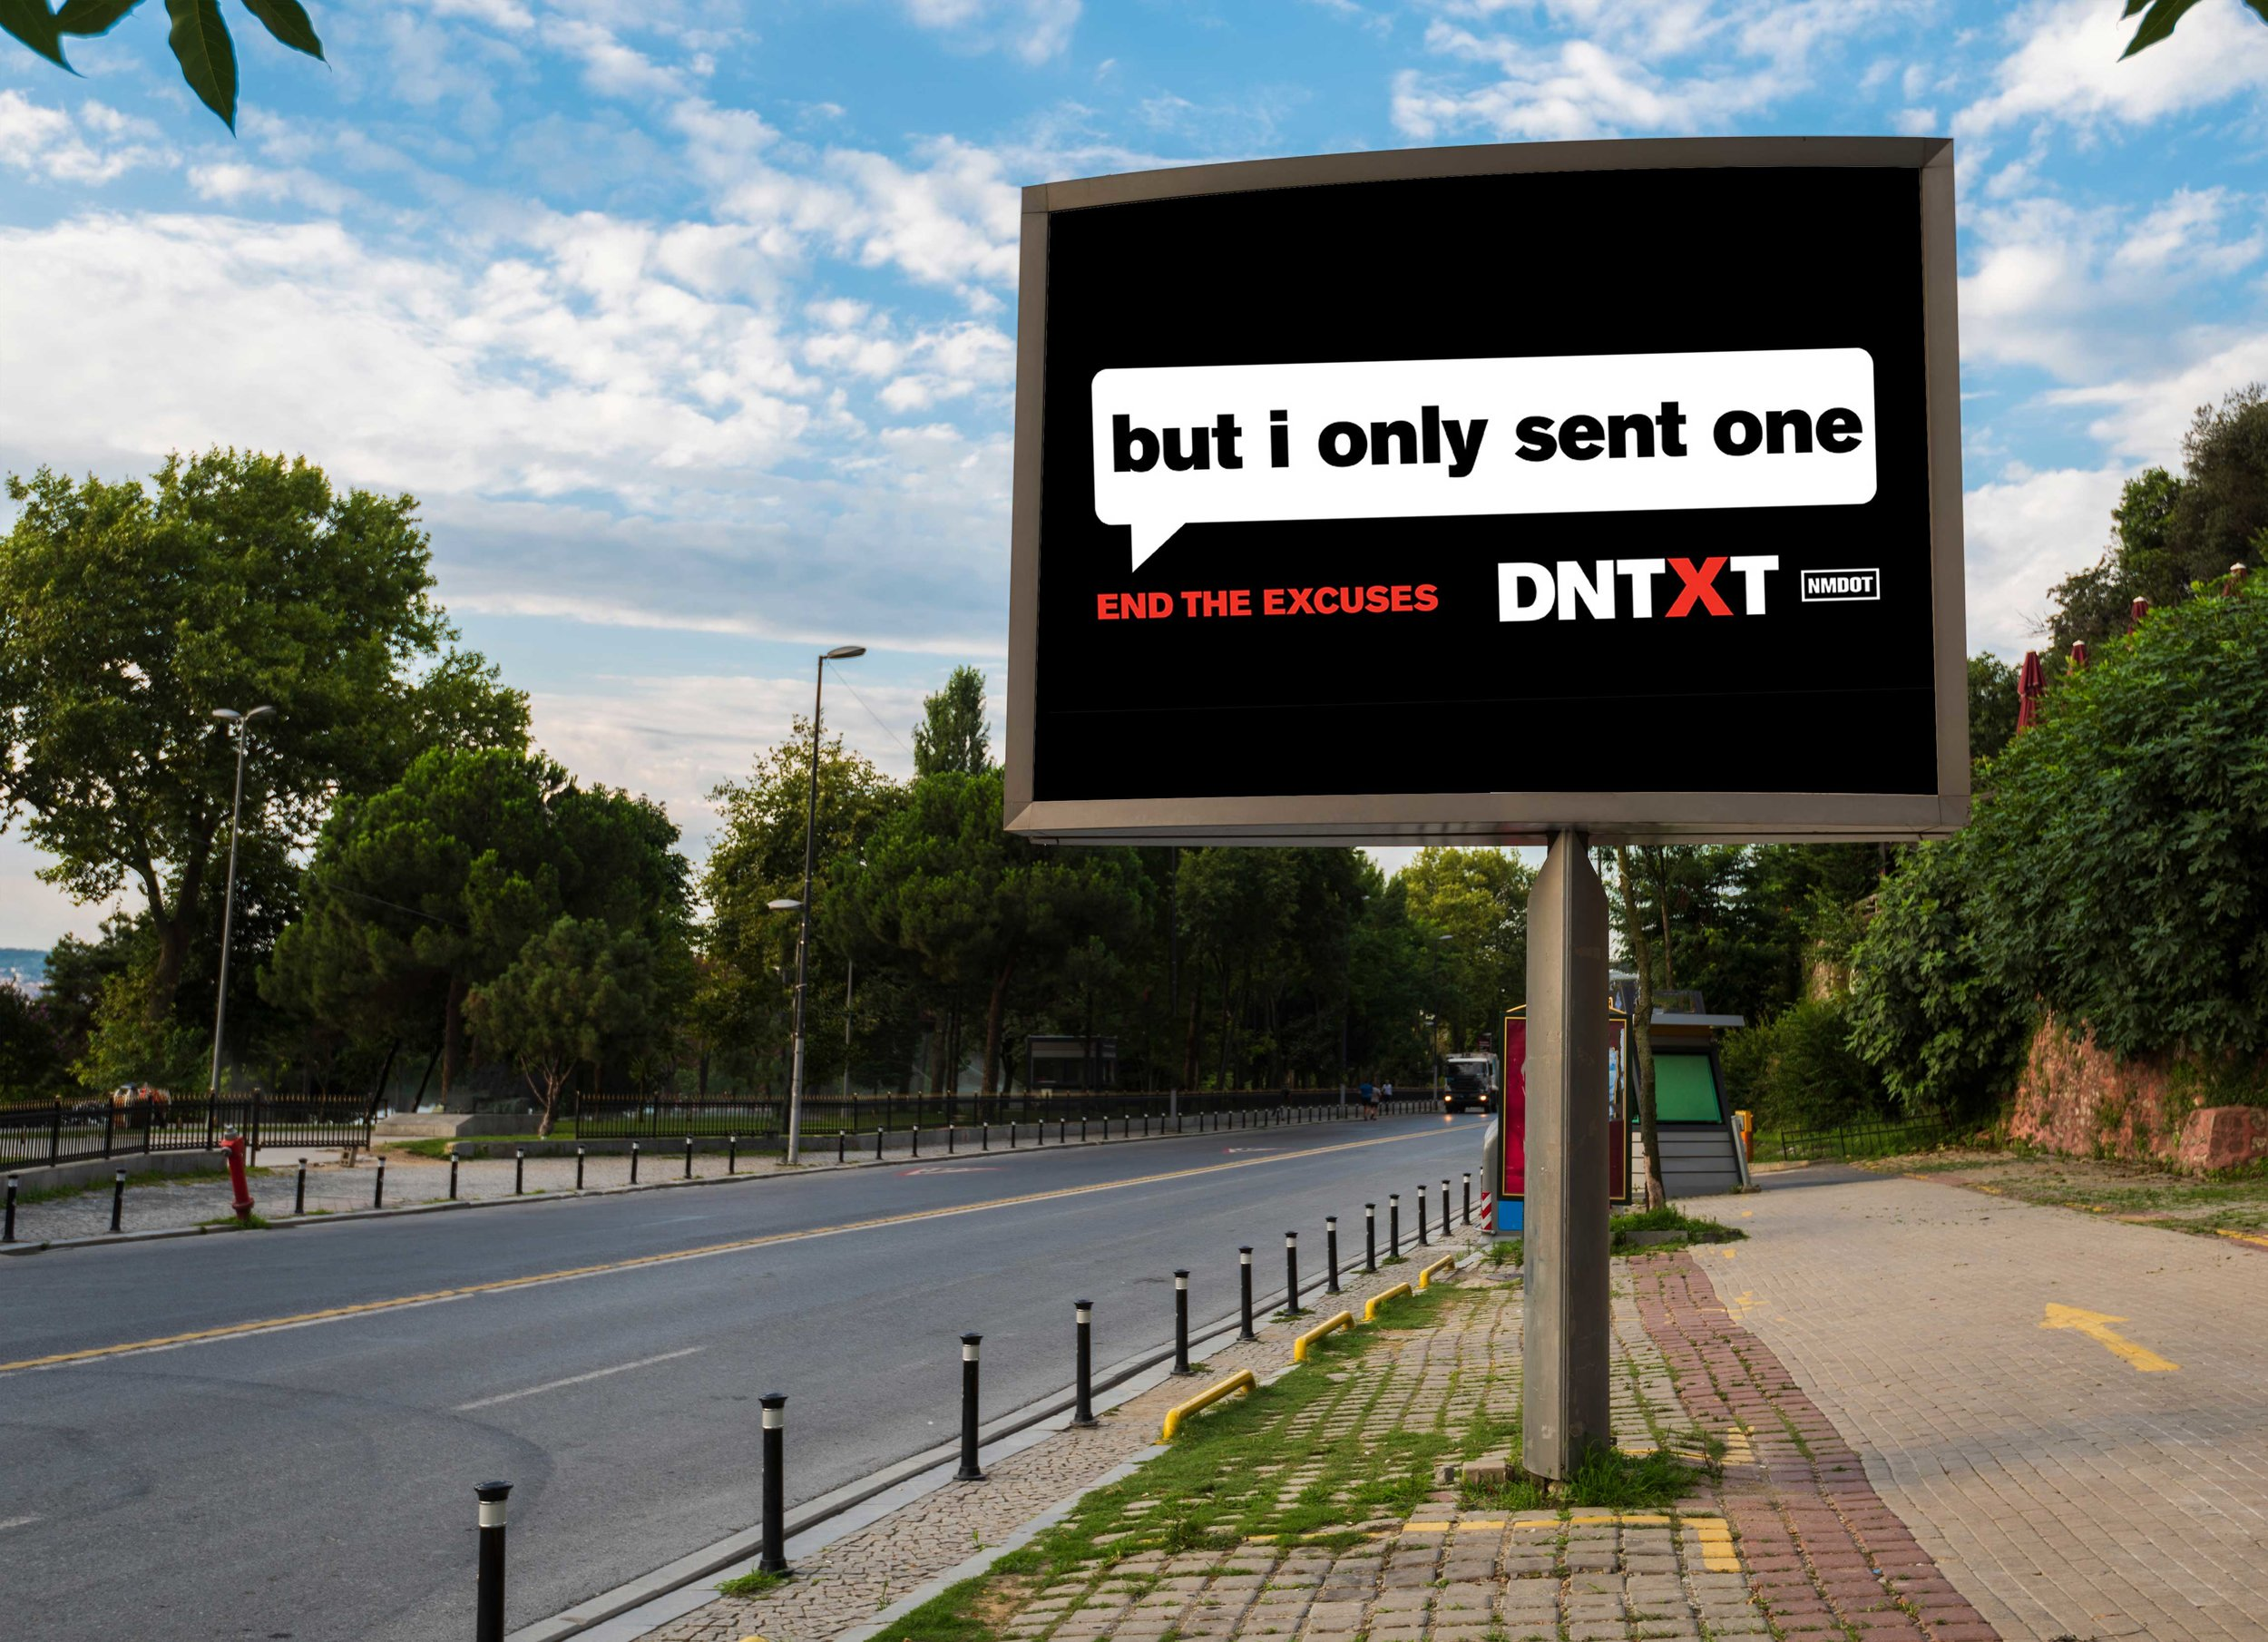 DNTXT_Excuses